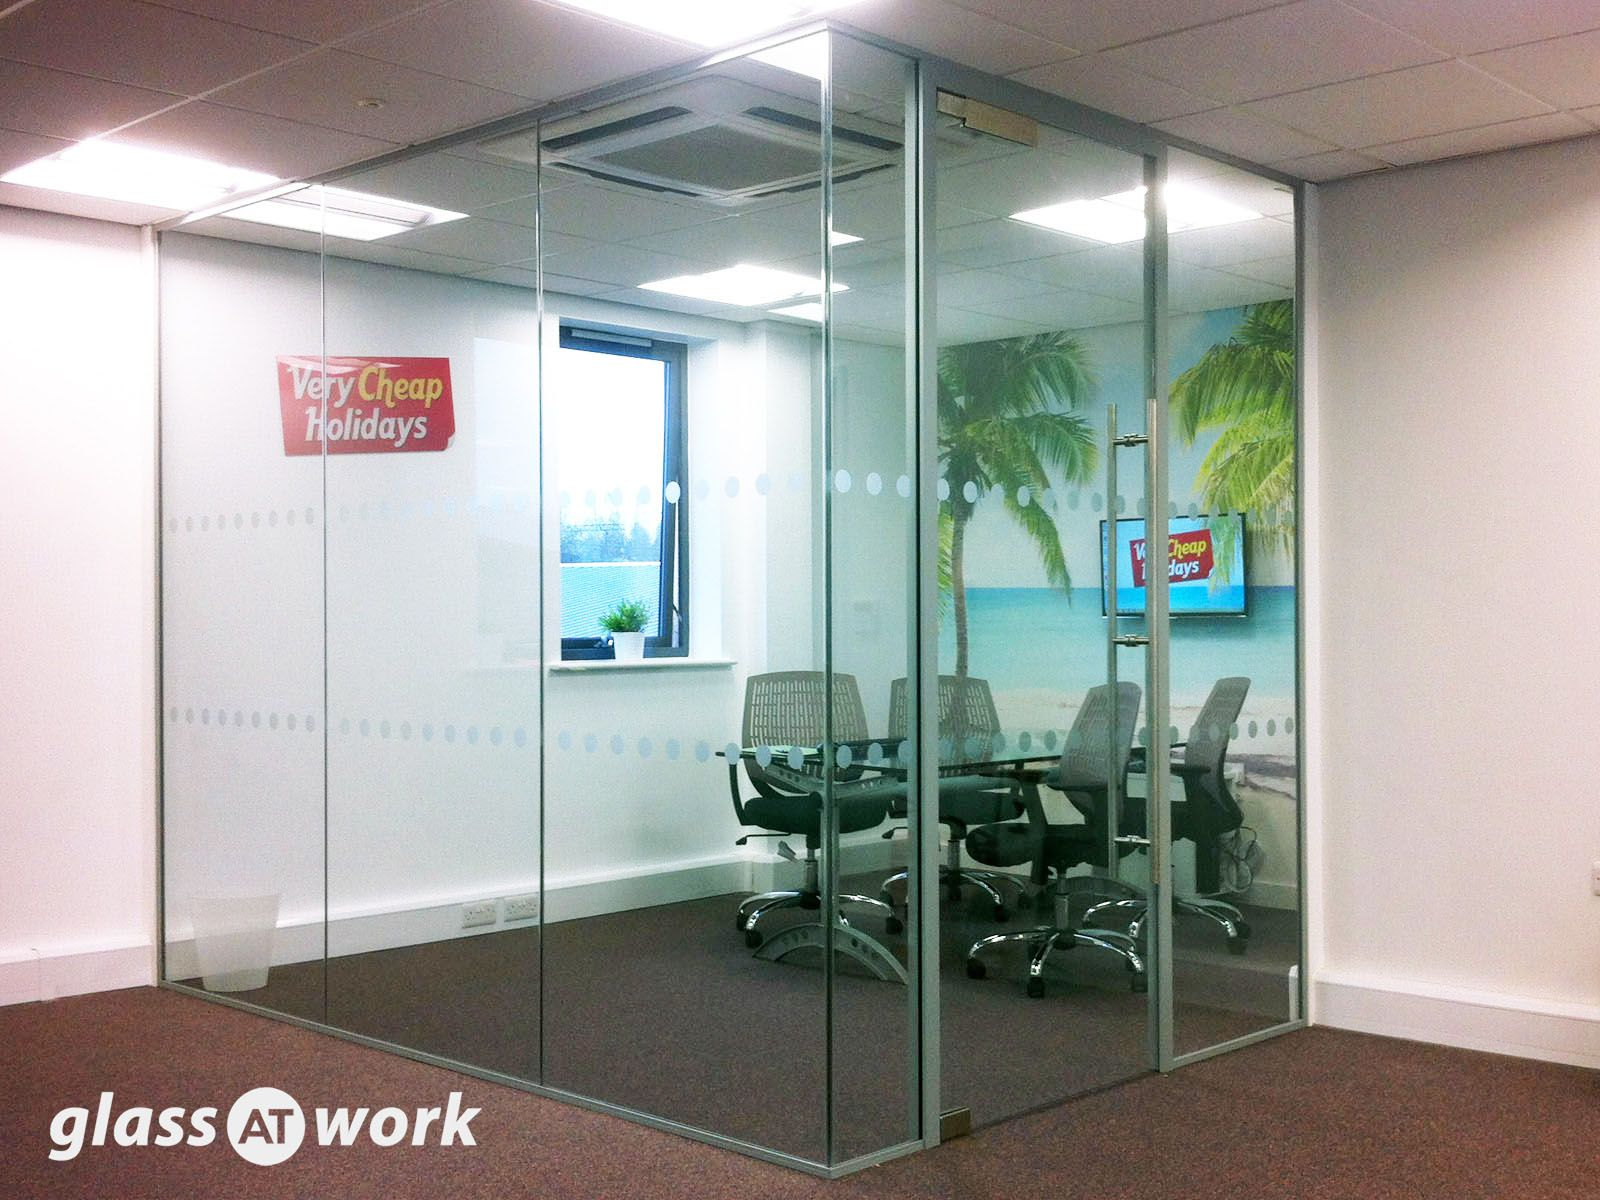 office corridor door glass. Single Glazed Glass Corner Office With A Framed Door And Standard DDA Film Manifestation Corridor